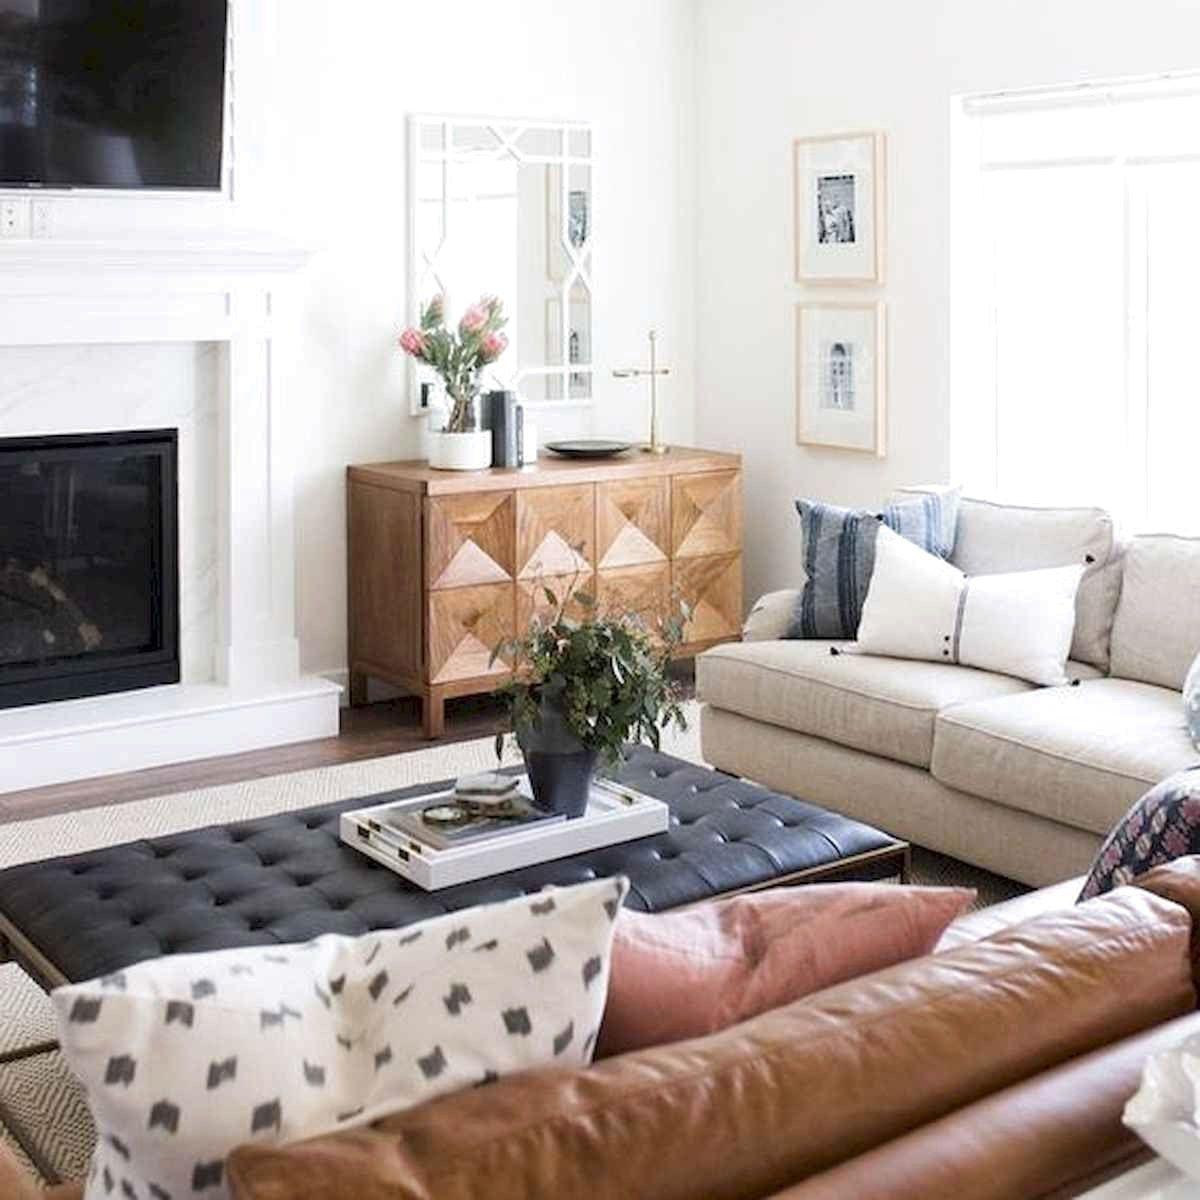 42 Favourite Modern Farmhouse Sofa Family Rooms Decor Ideas And